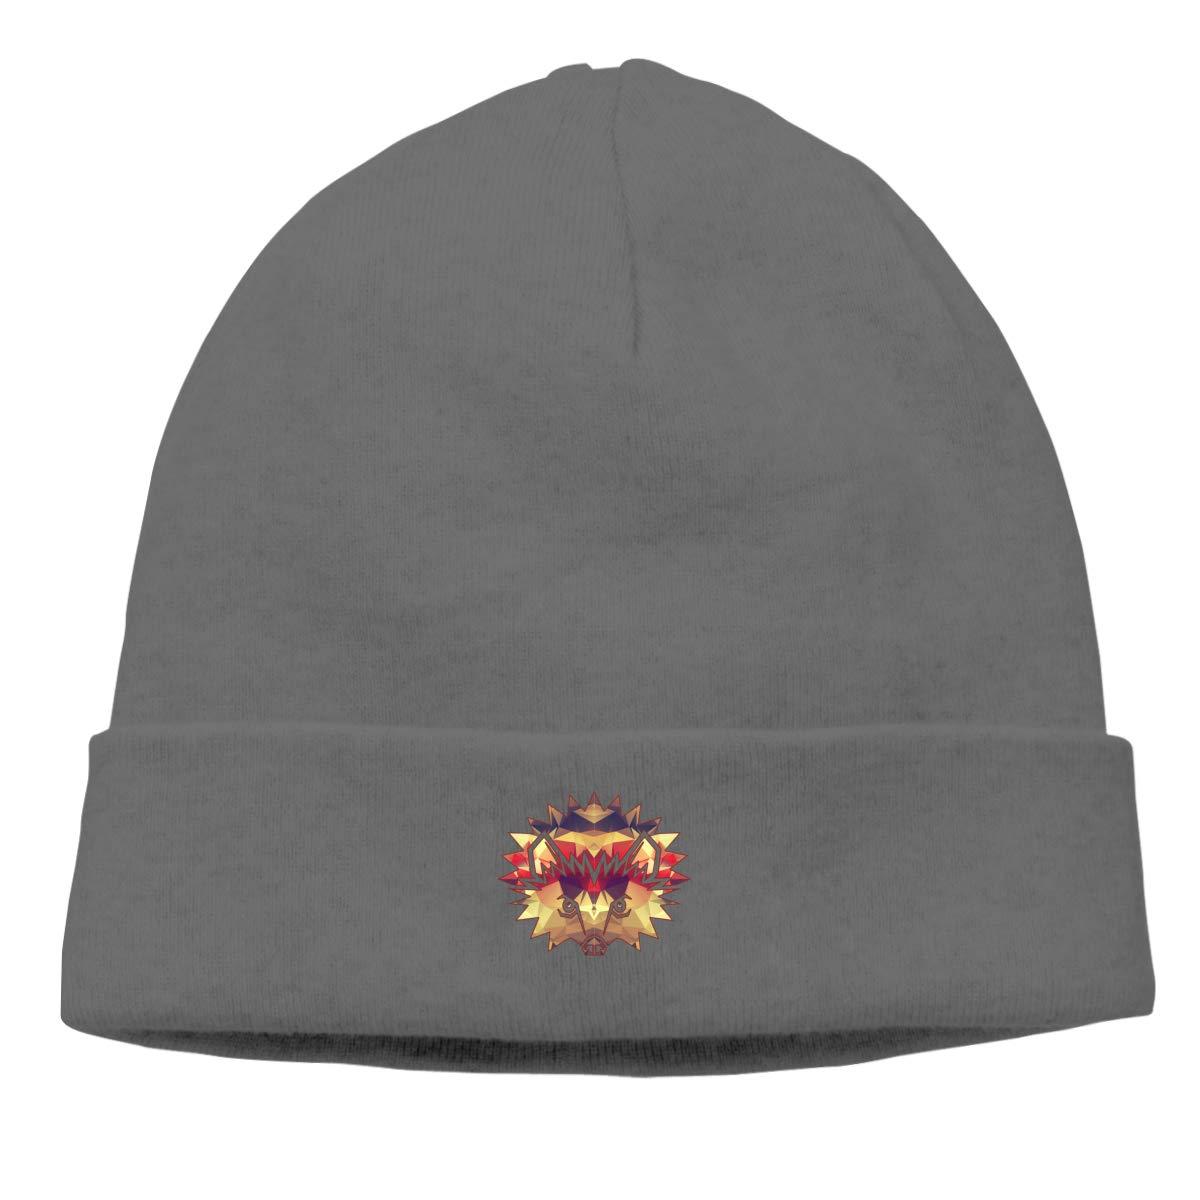 Riokk az Hedgehog Geometric Knit Cap Knit Hats Skull for Mens Deep Heather